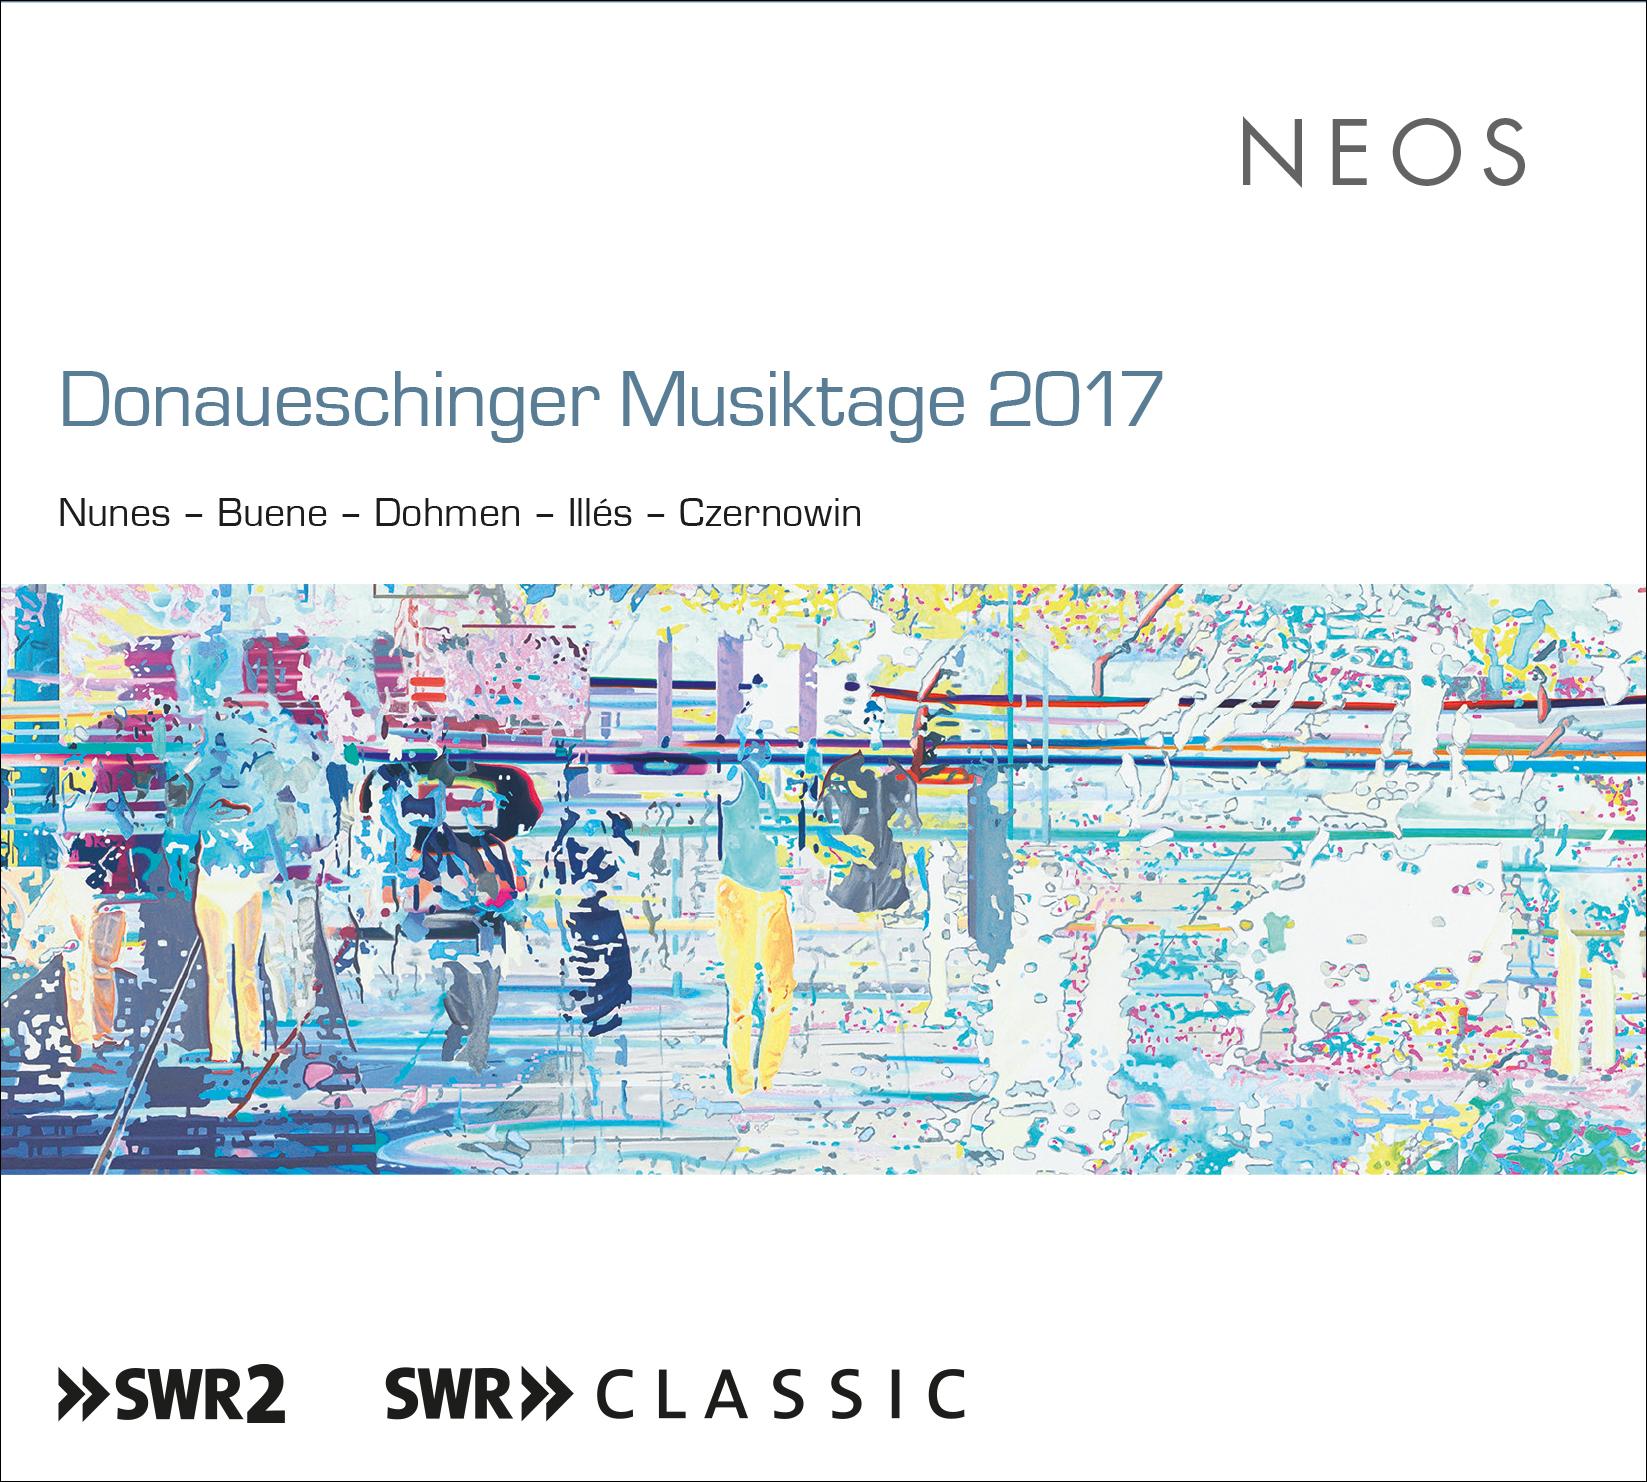 NEOS-Donaueschinger-Musiktage-2017.jpg